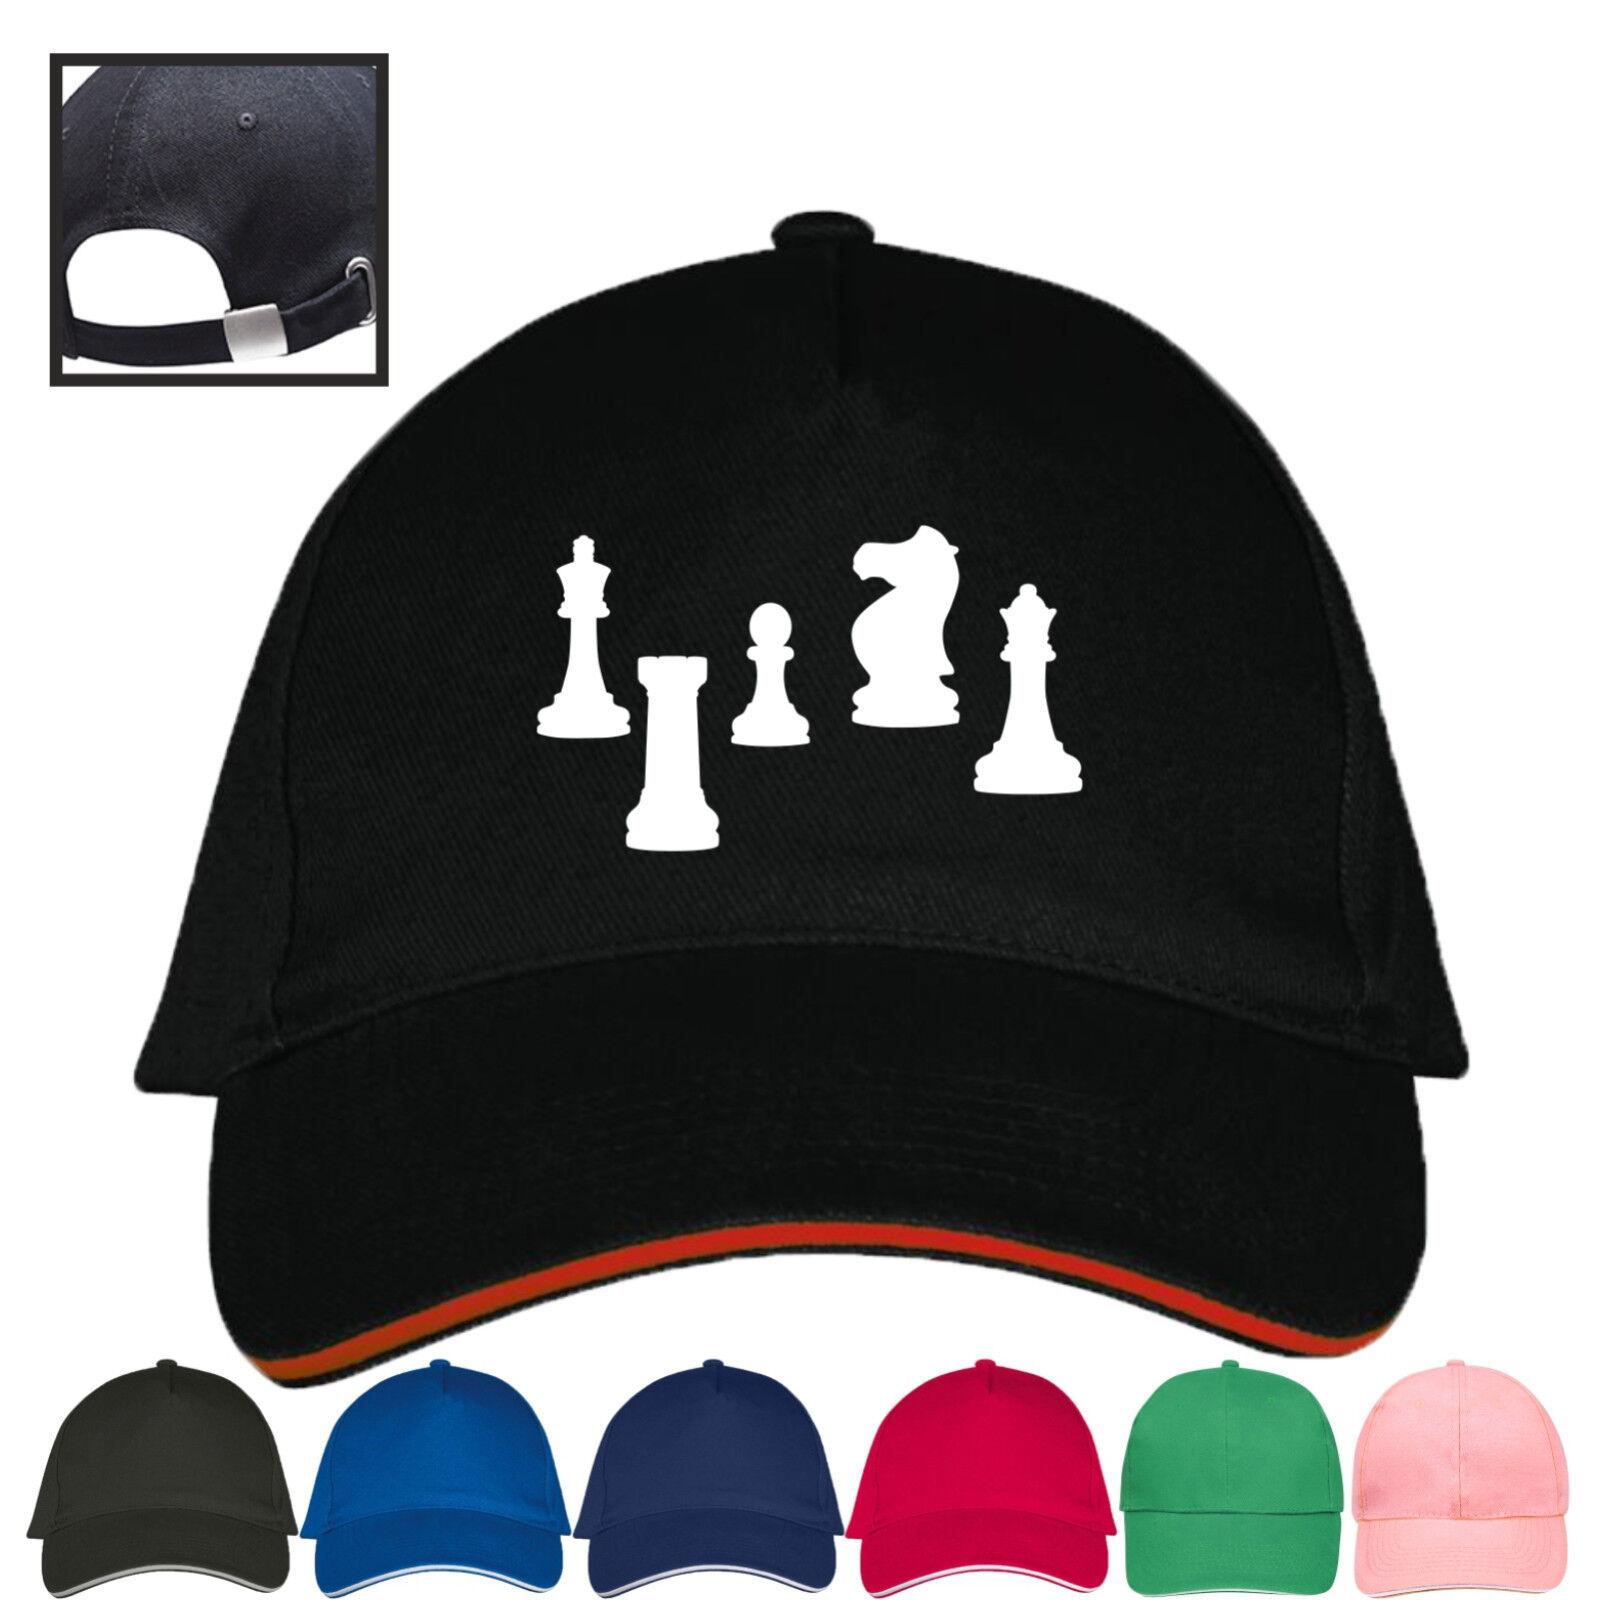 Cap Schach Schachspiel Schachspieler Schachfigur Bauer Pferd Basecap Mütze NEU